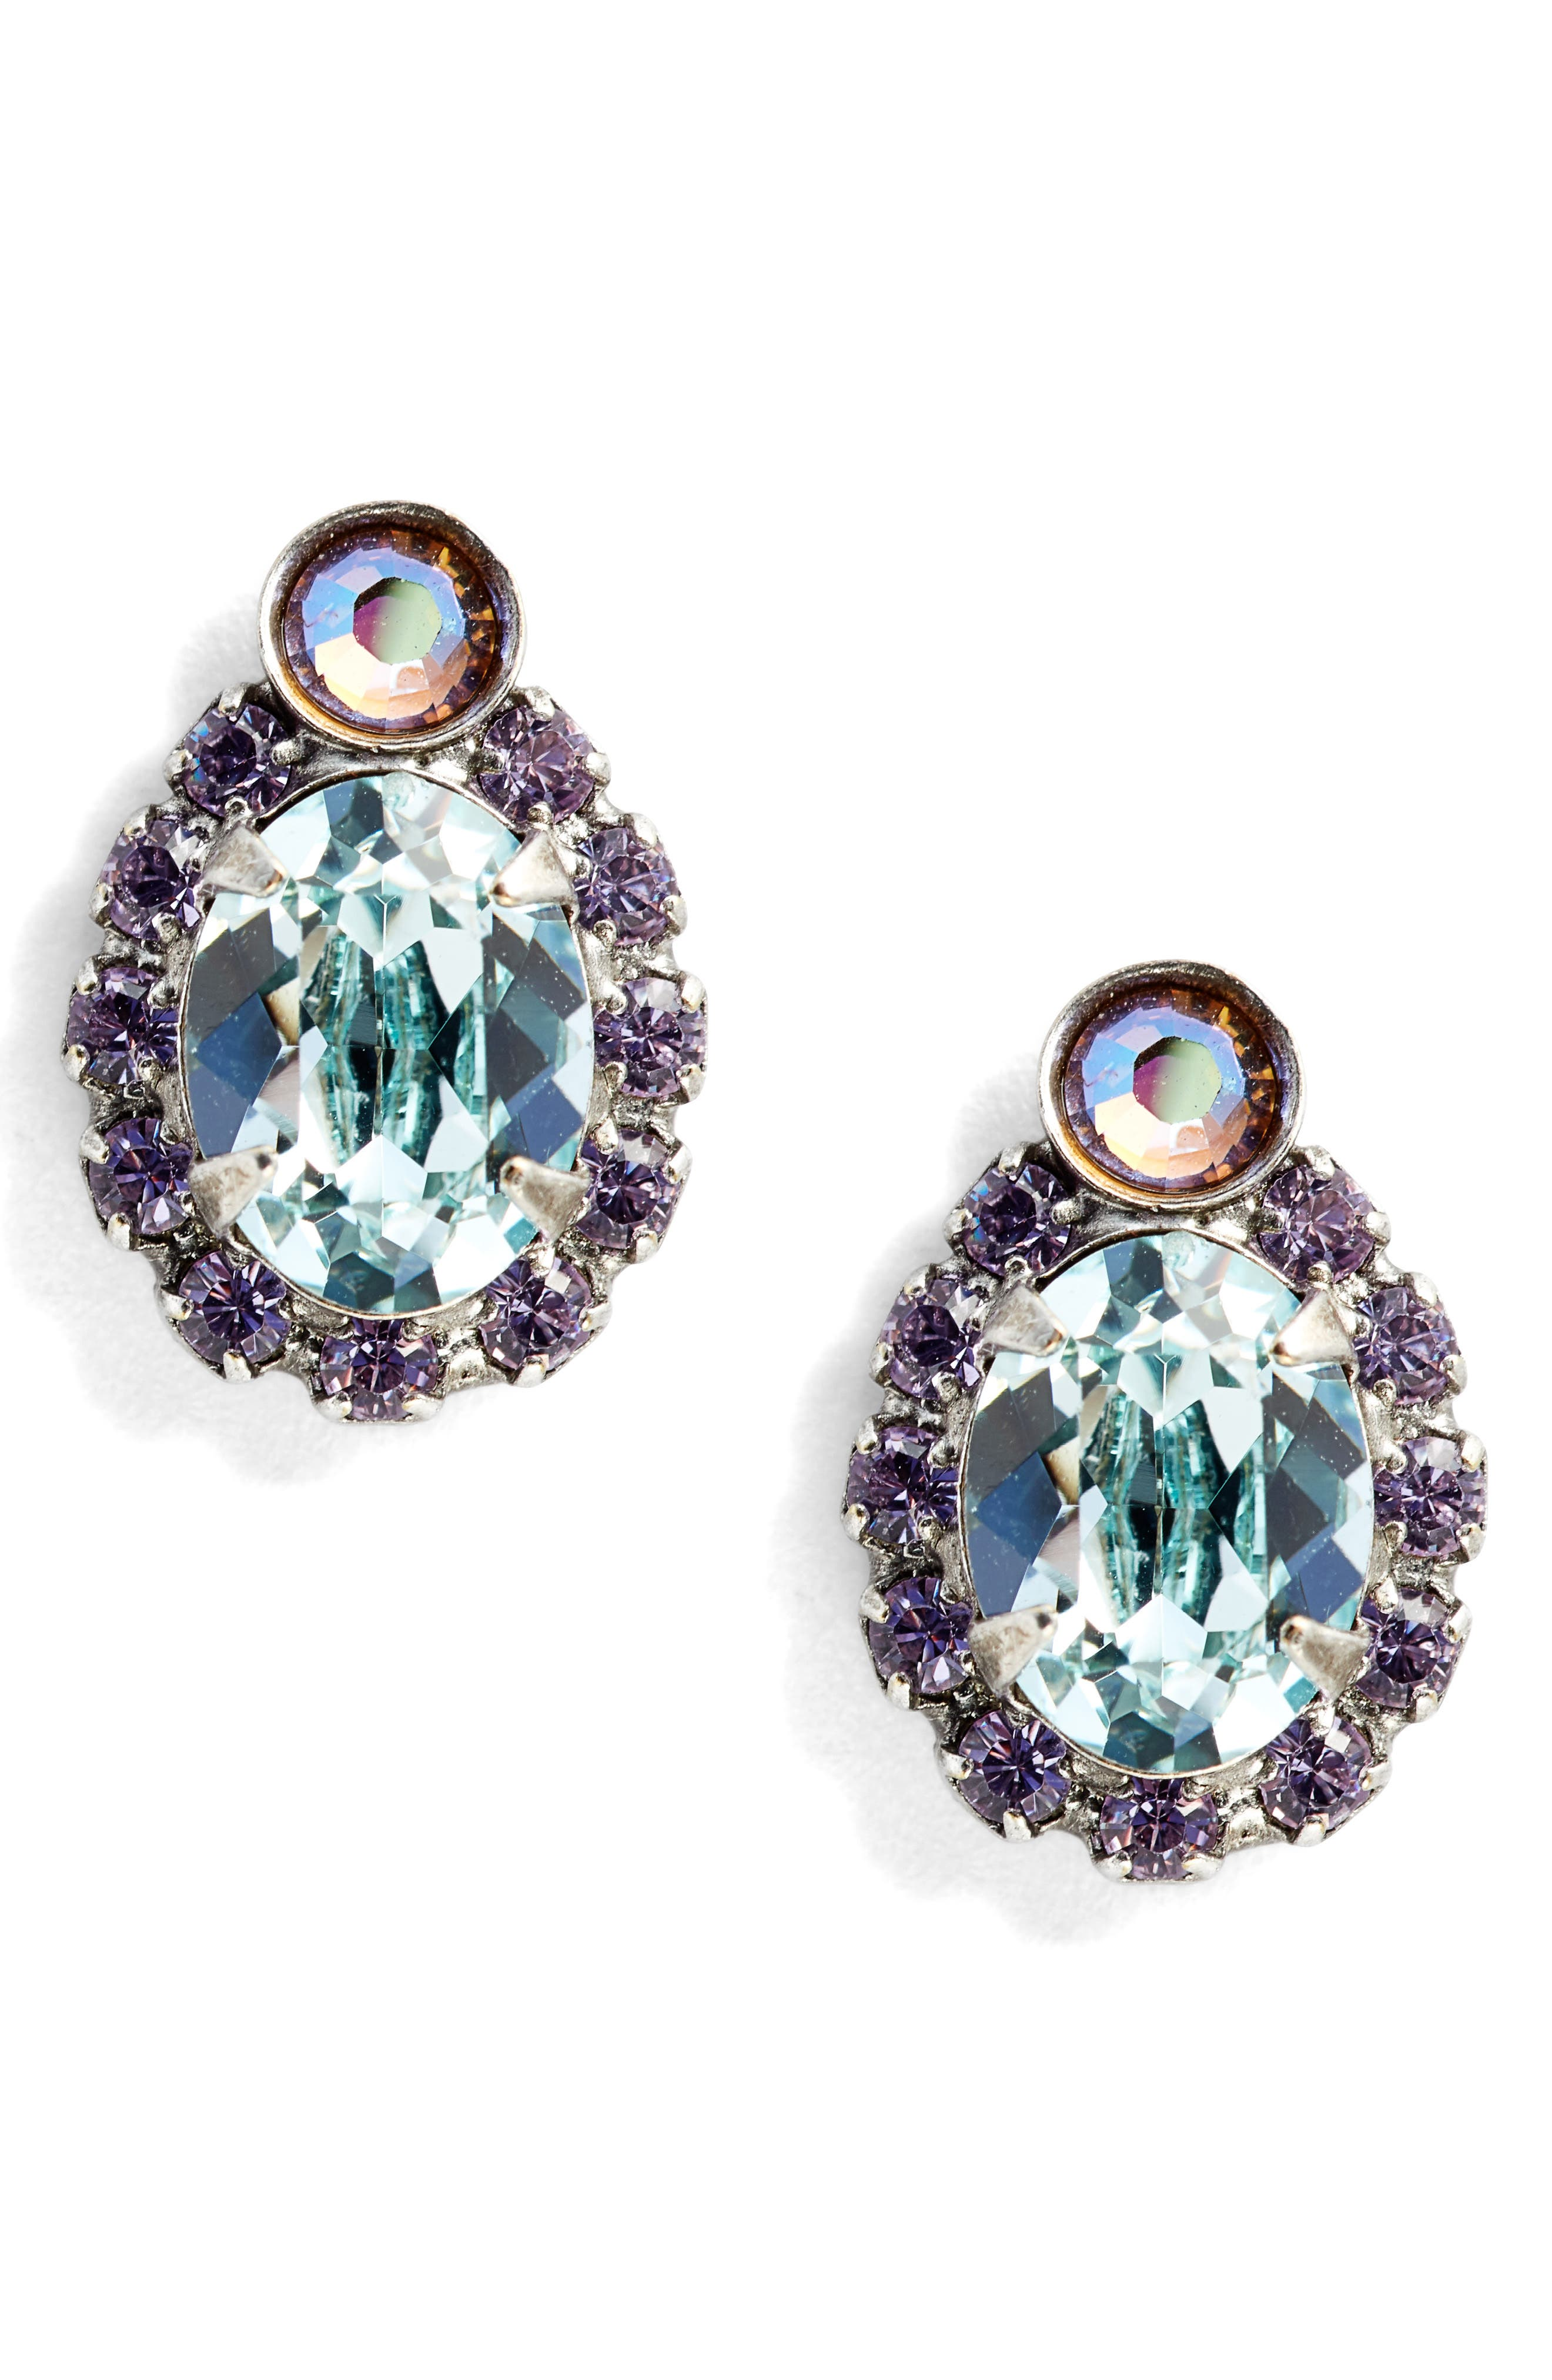 Pansy Crystal Earrings,                             Main thumbnail 1, color,                             400